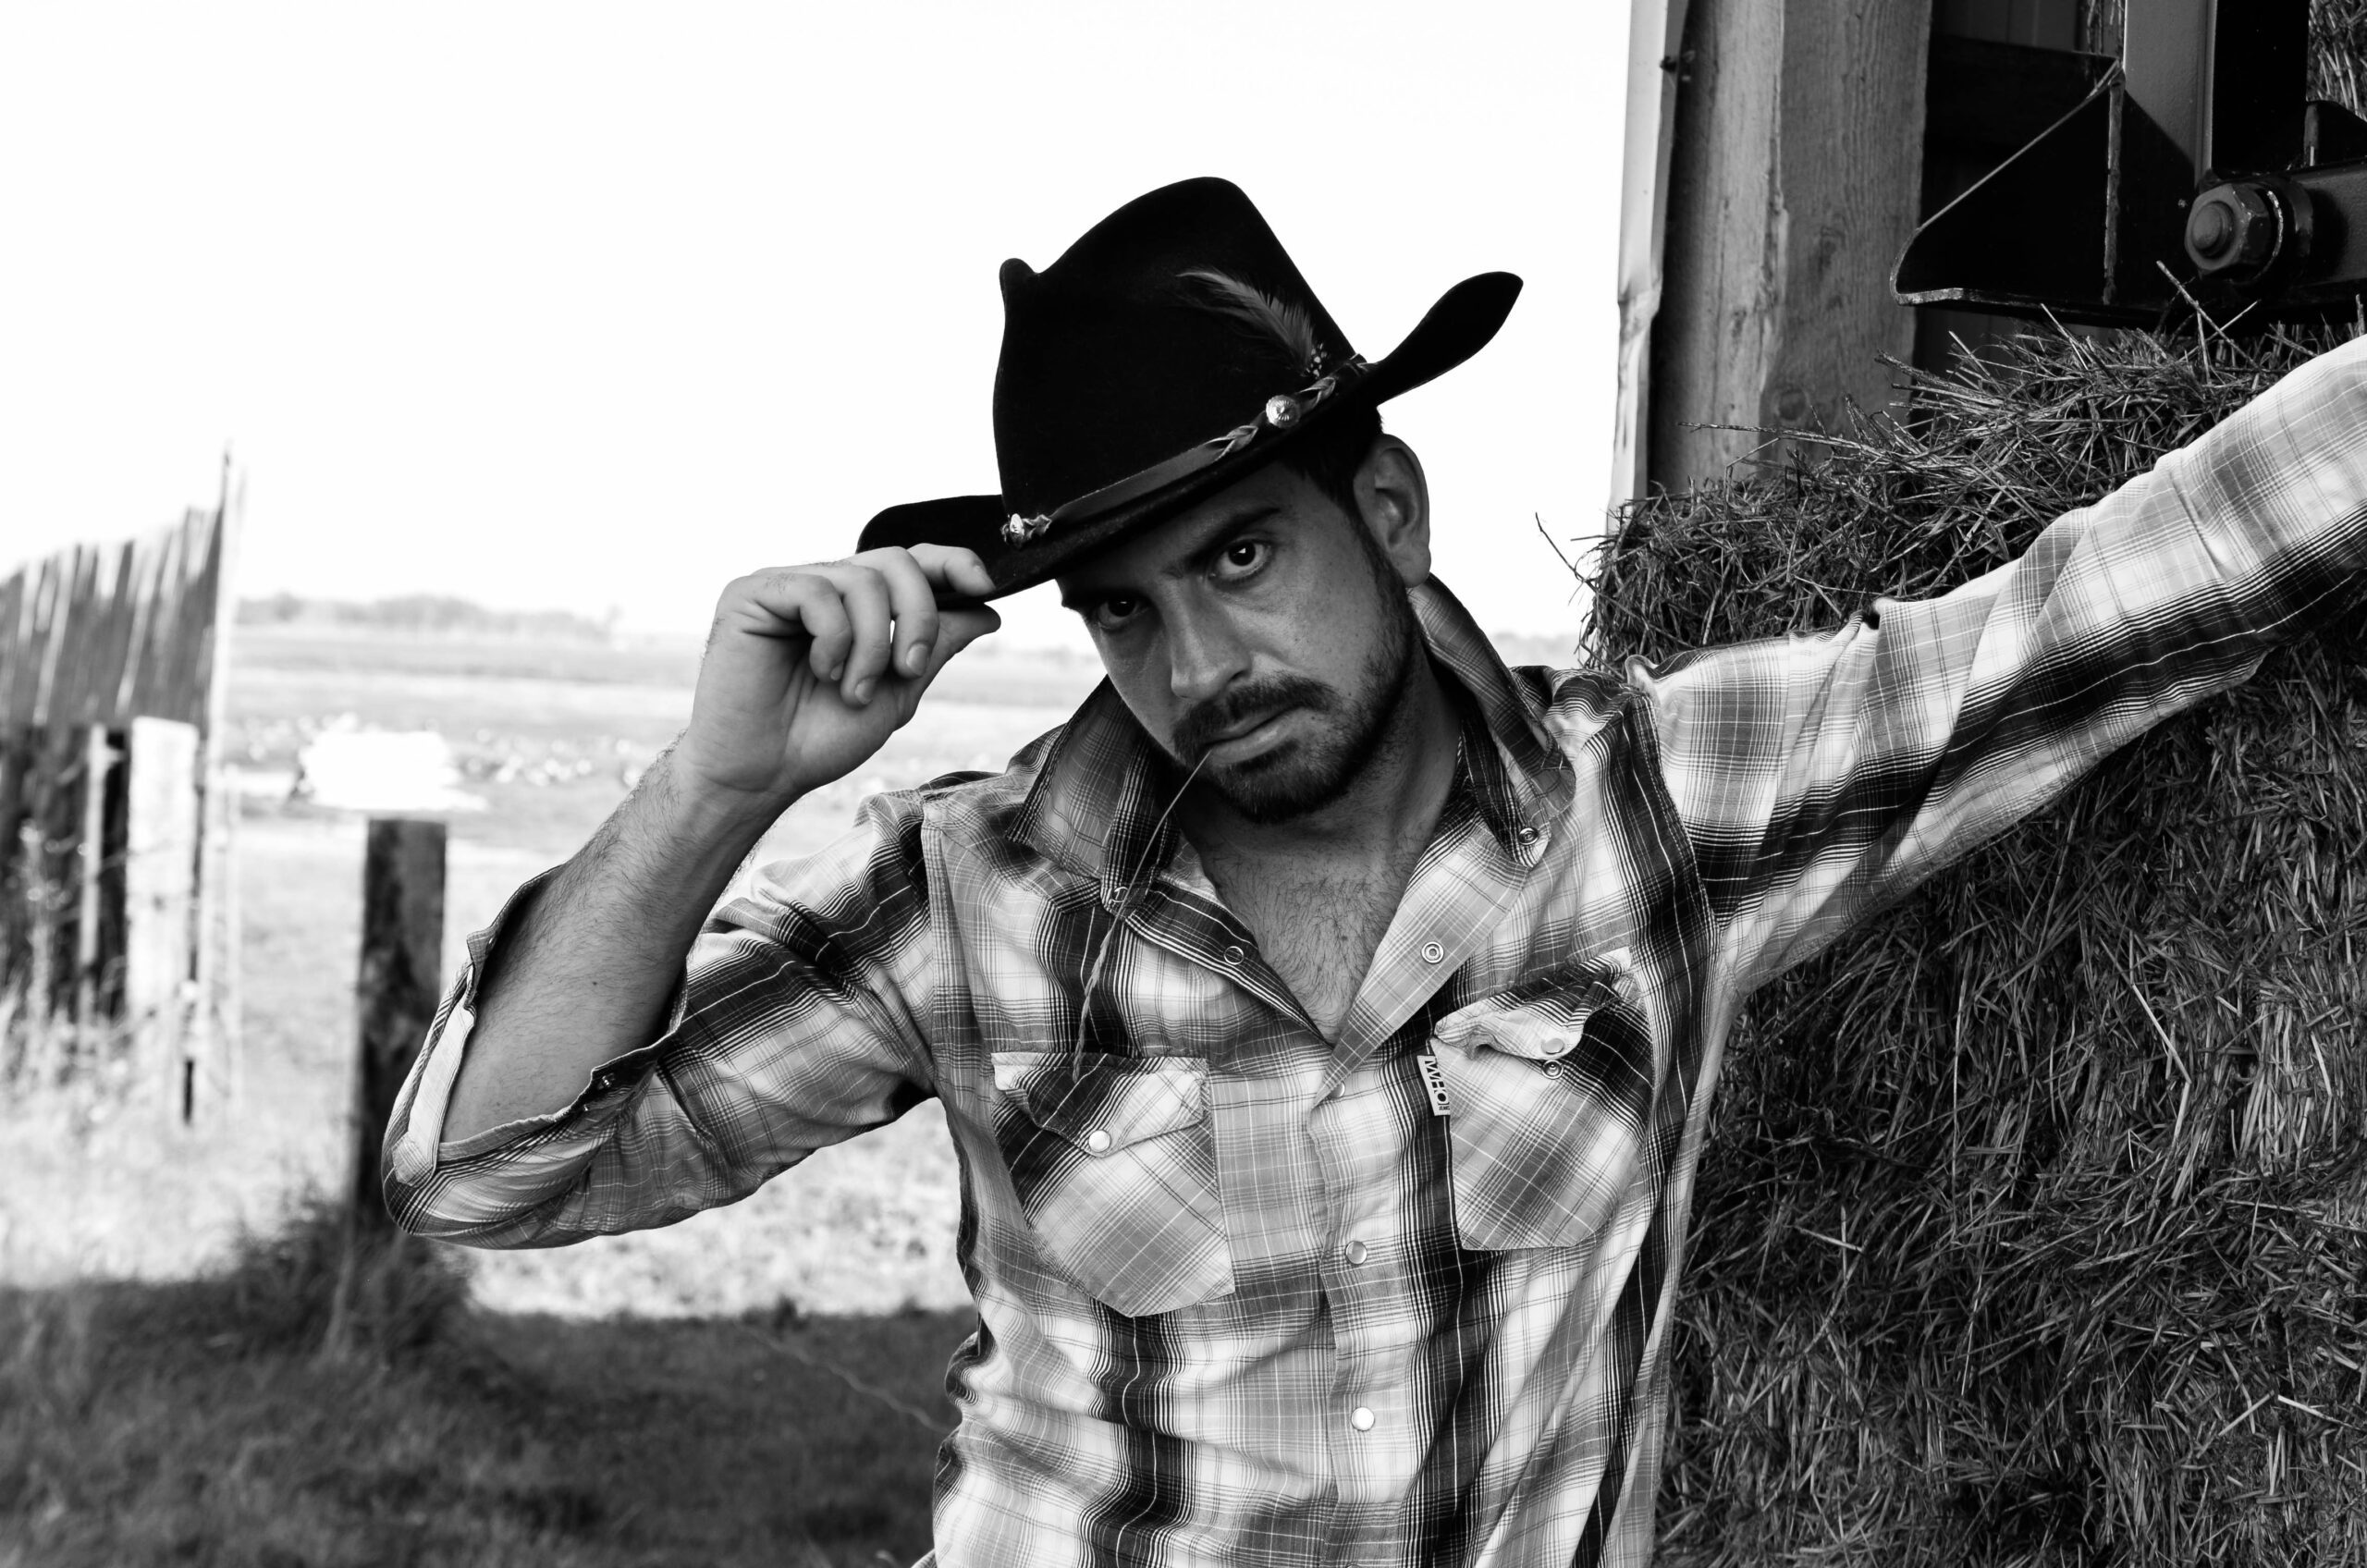 Cowboy Johnny Moxx